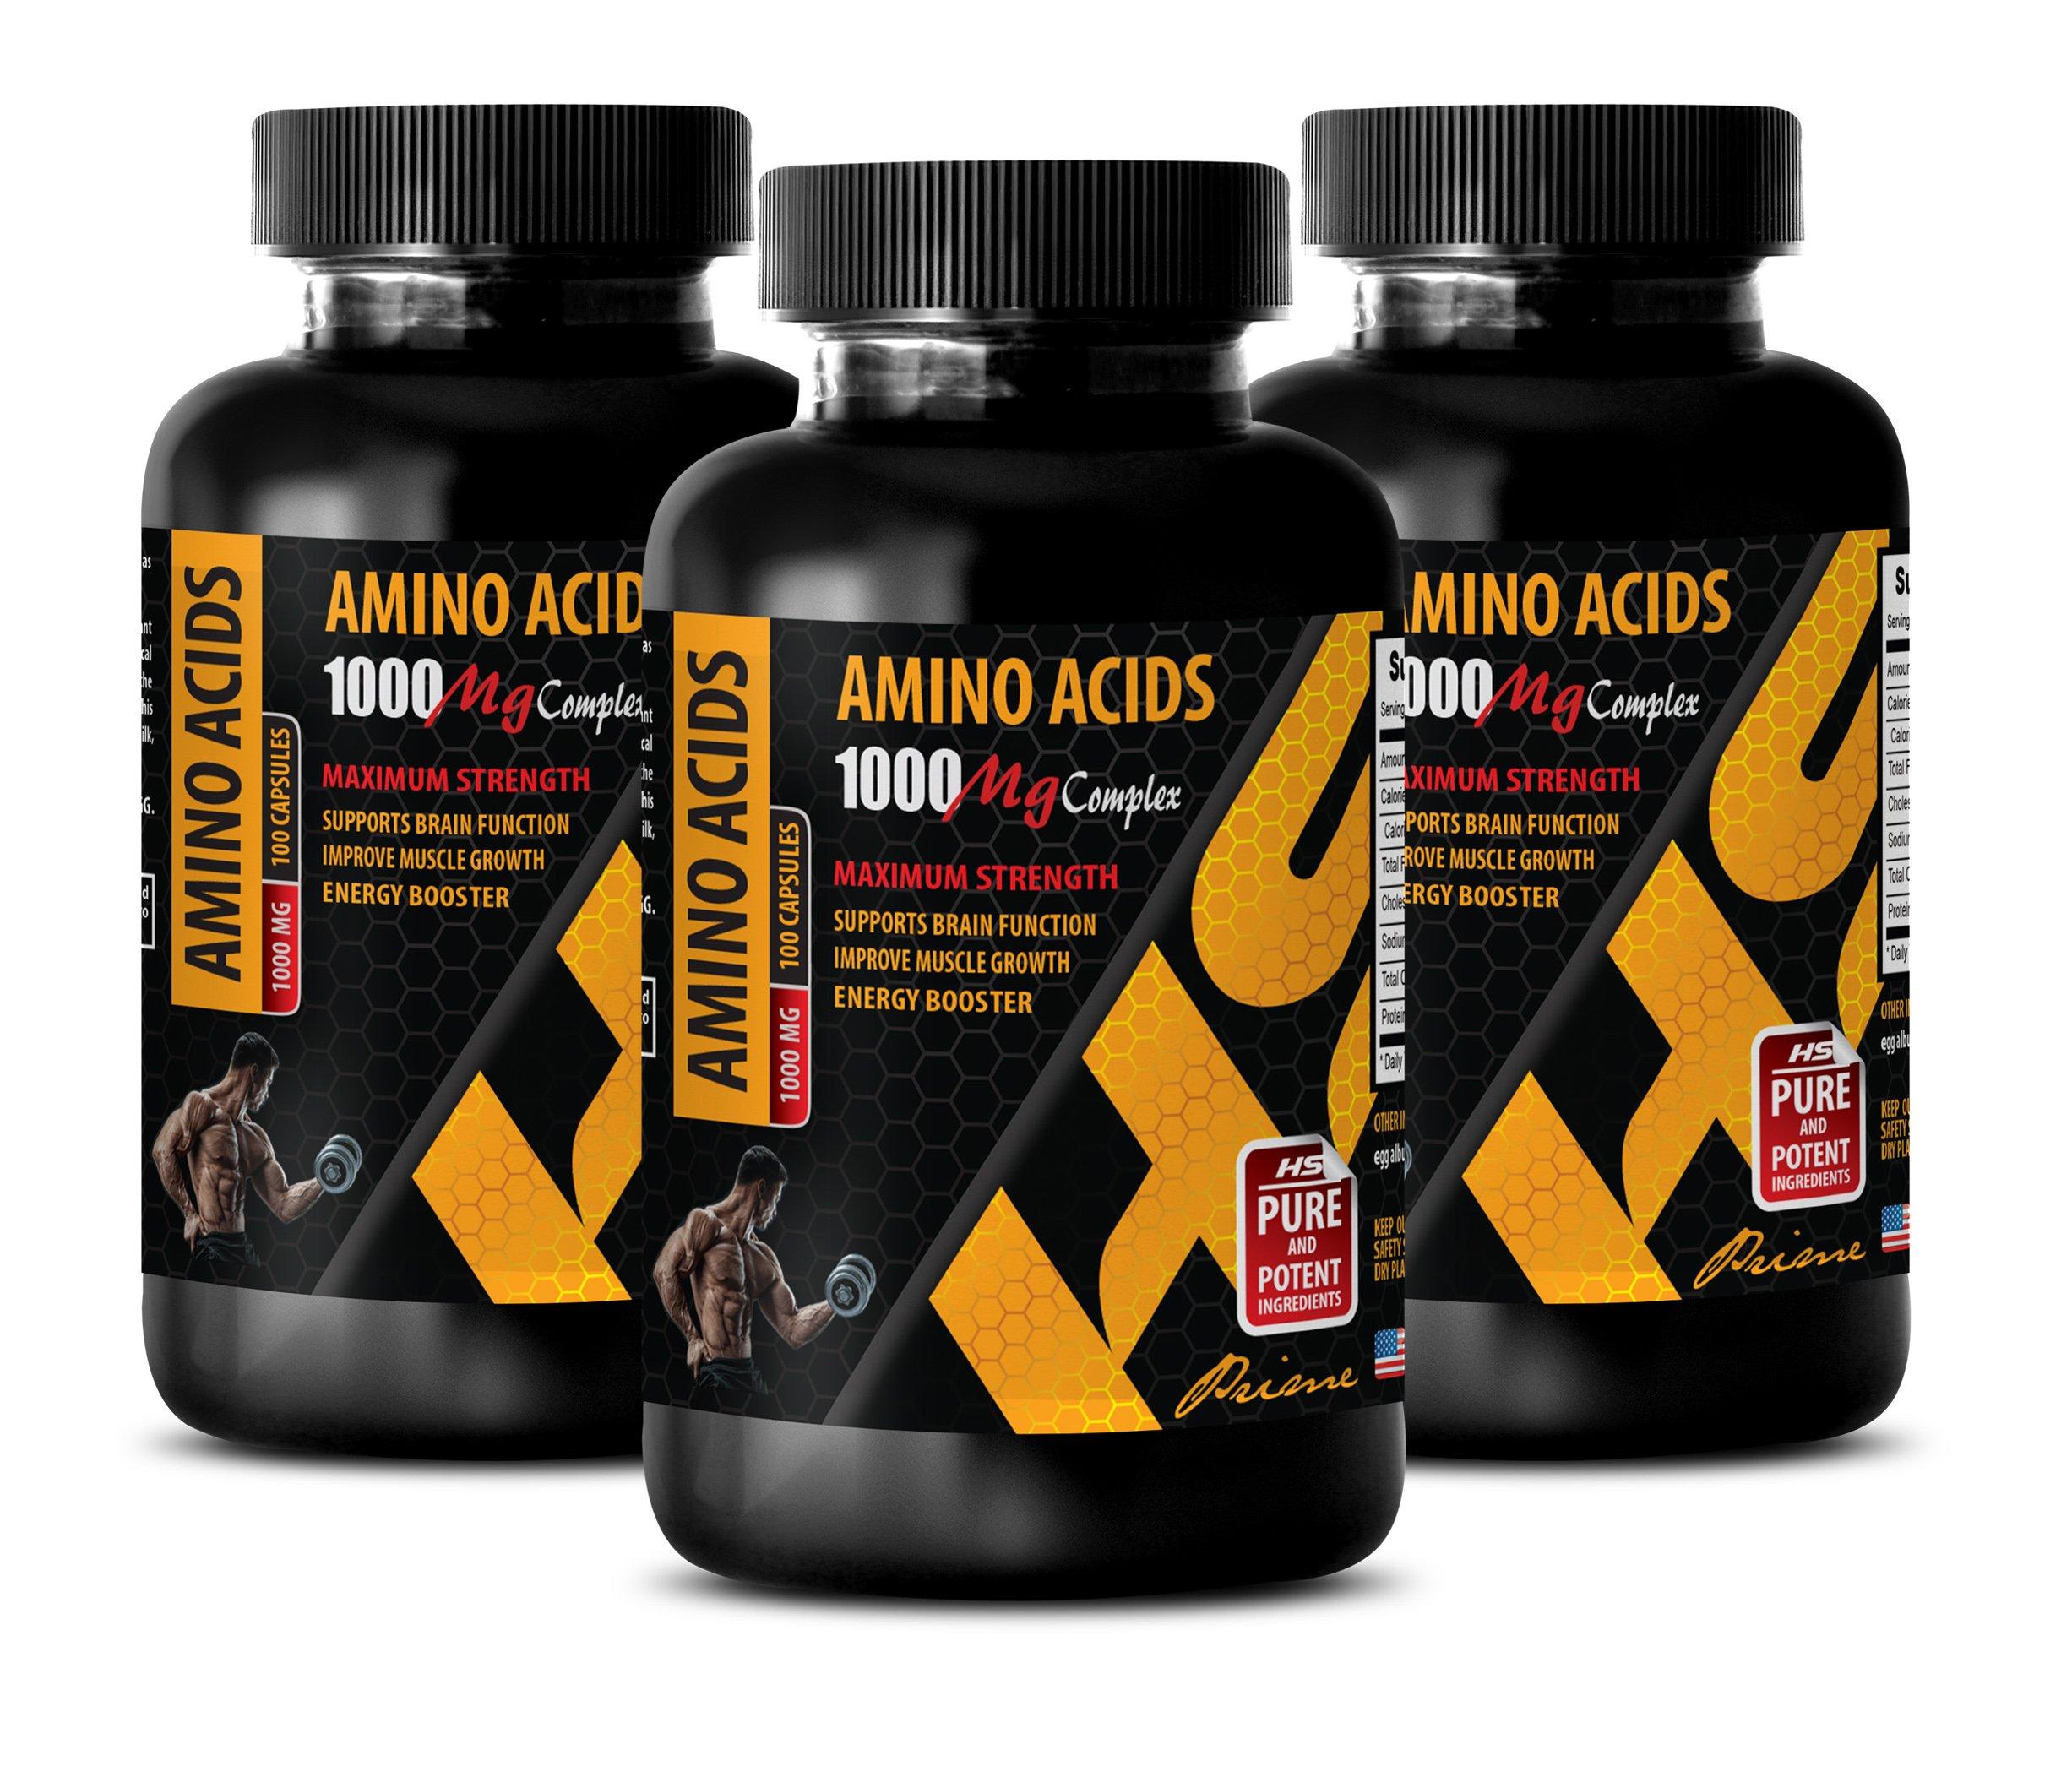 Bodybuilding Vitamins - Amino Acids 1000 mg Complex - Extra Strength - l-Lysine Capsules - 3 Bottles 300 Capsules